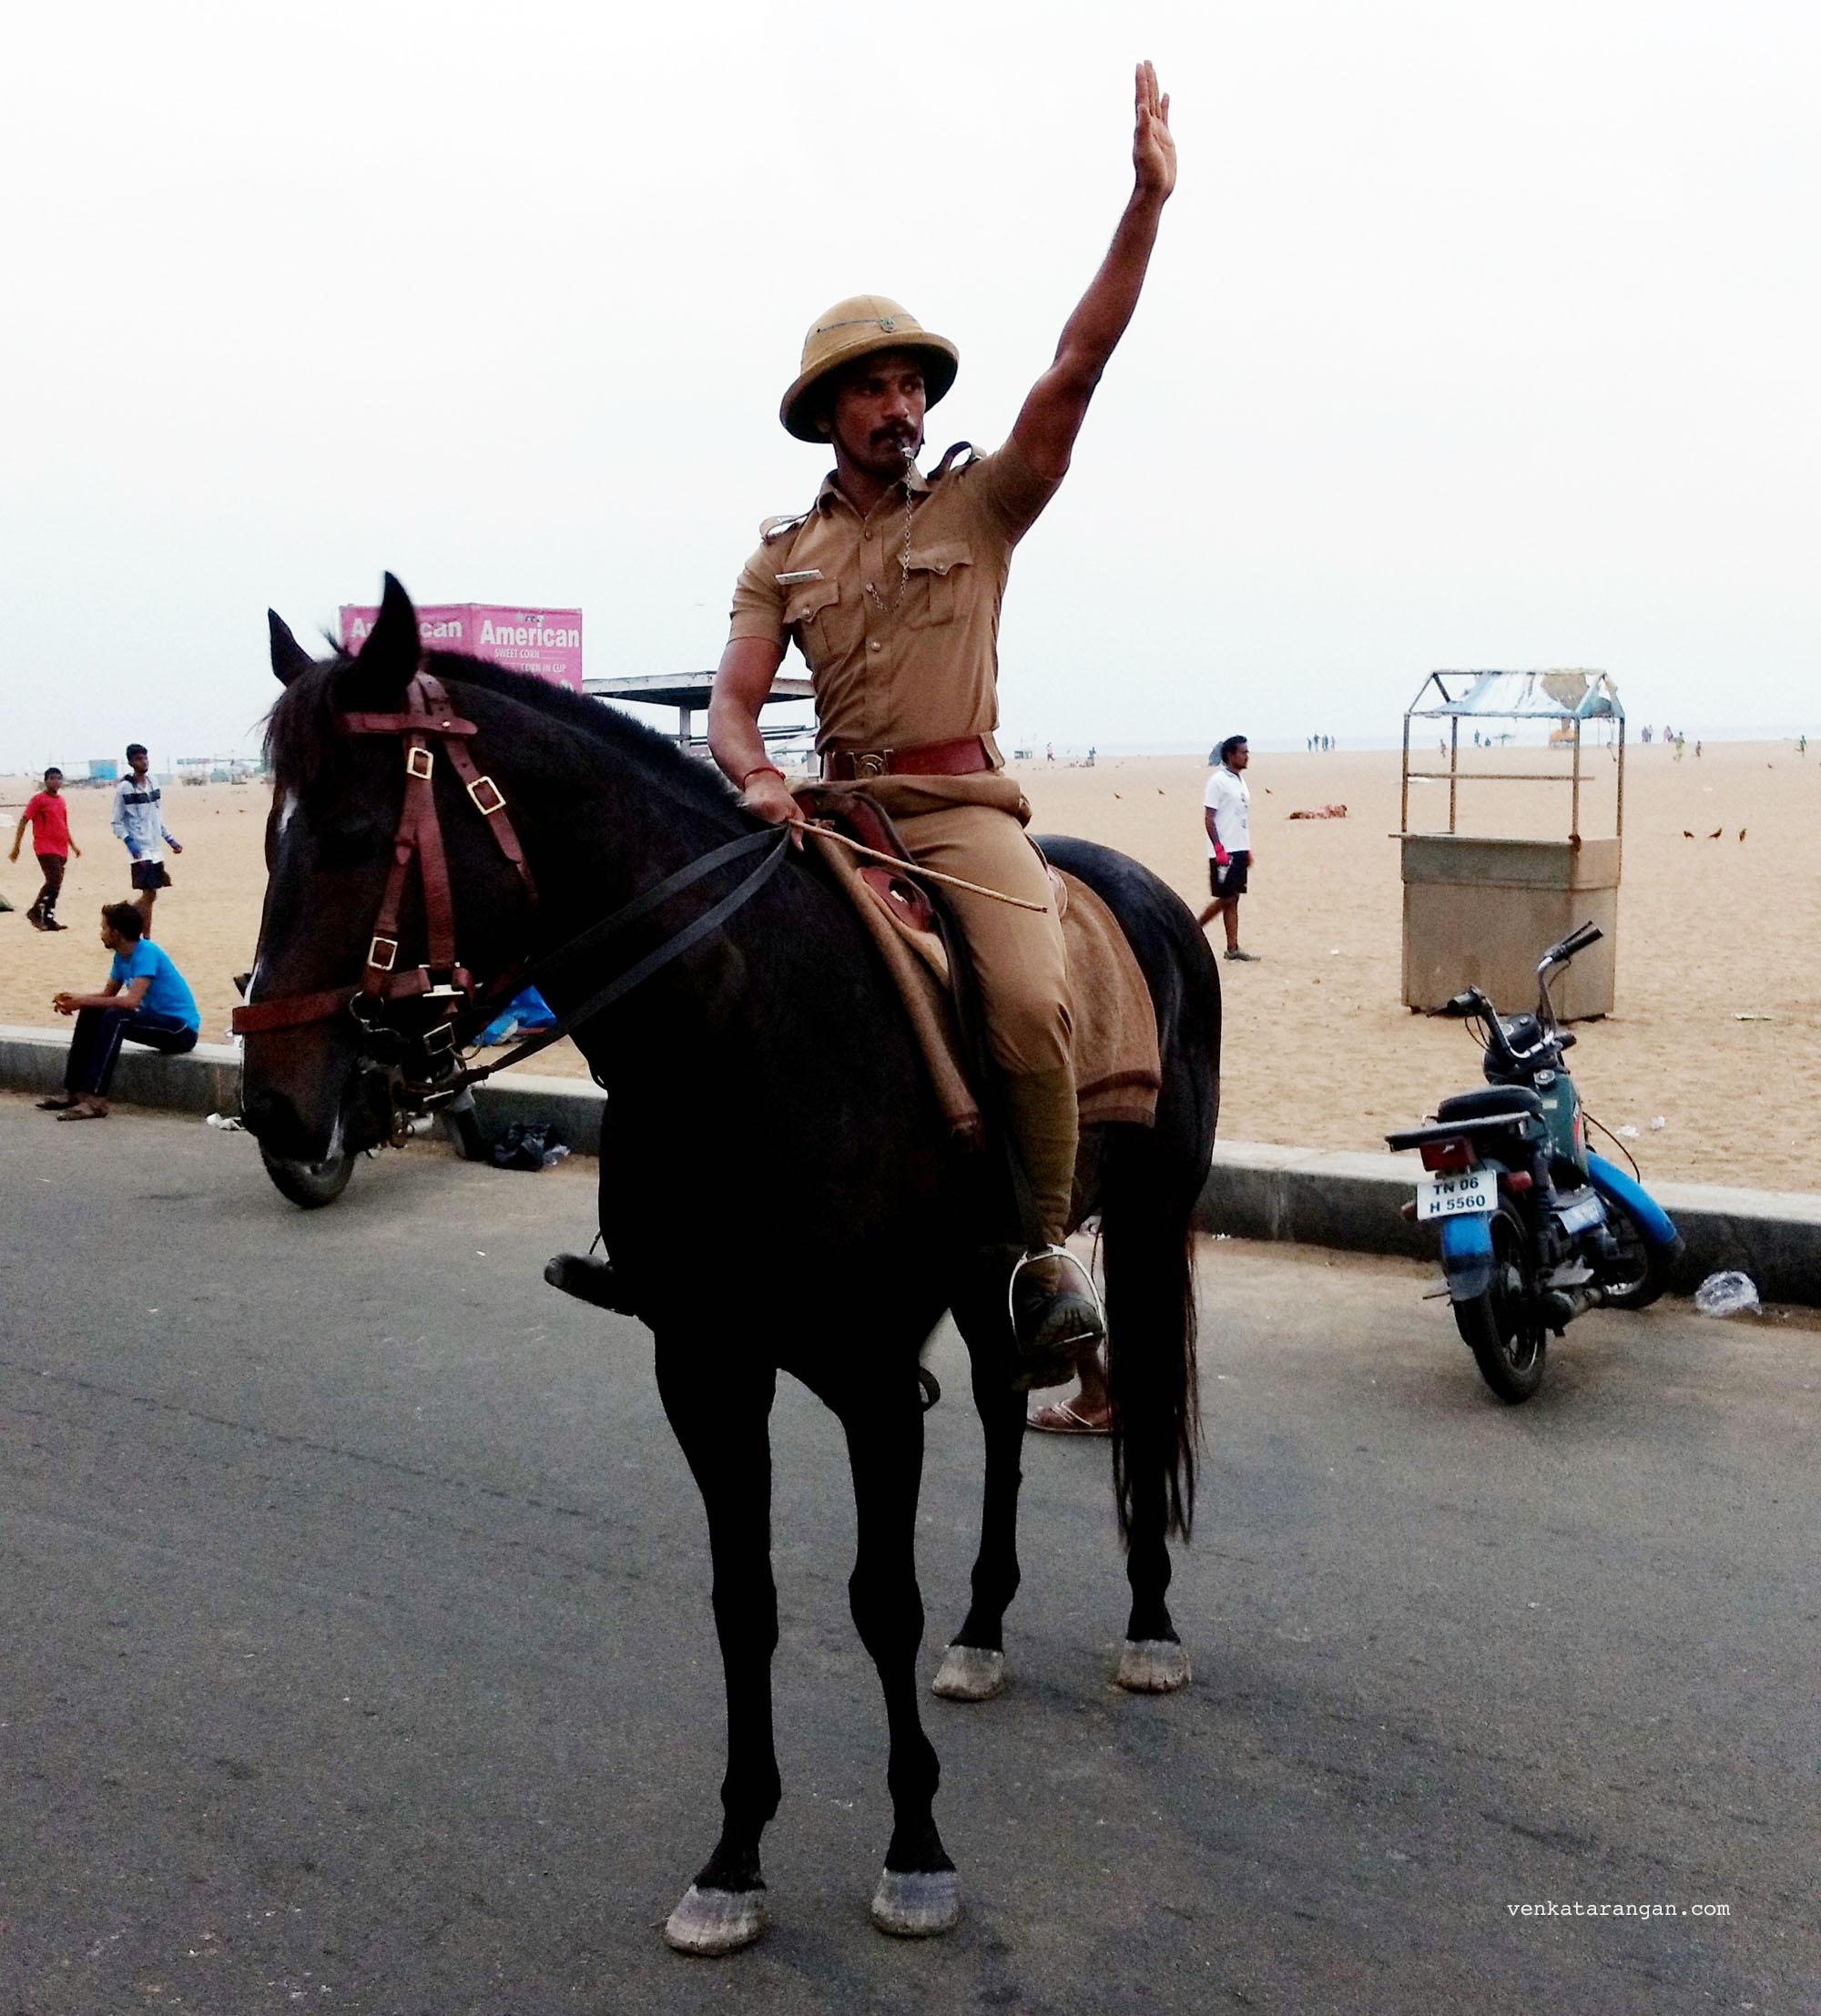 aid-india-chennai-marathon-2016-3